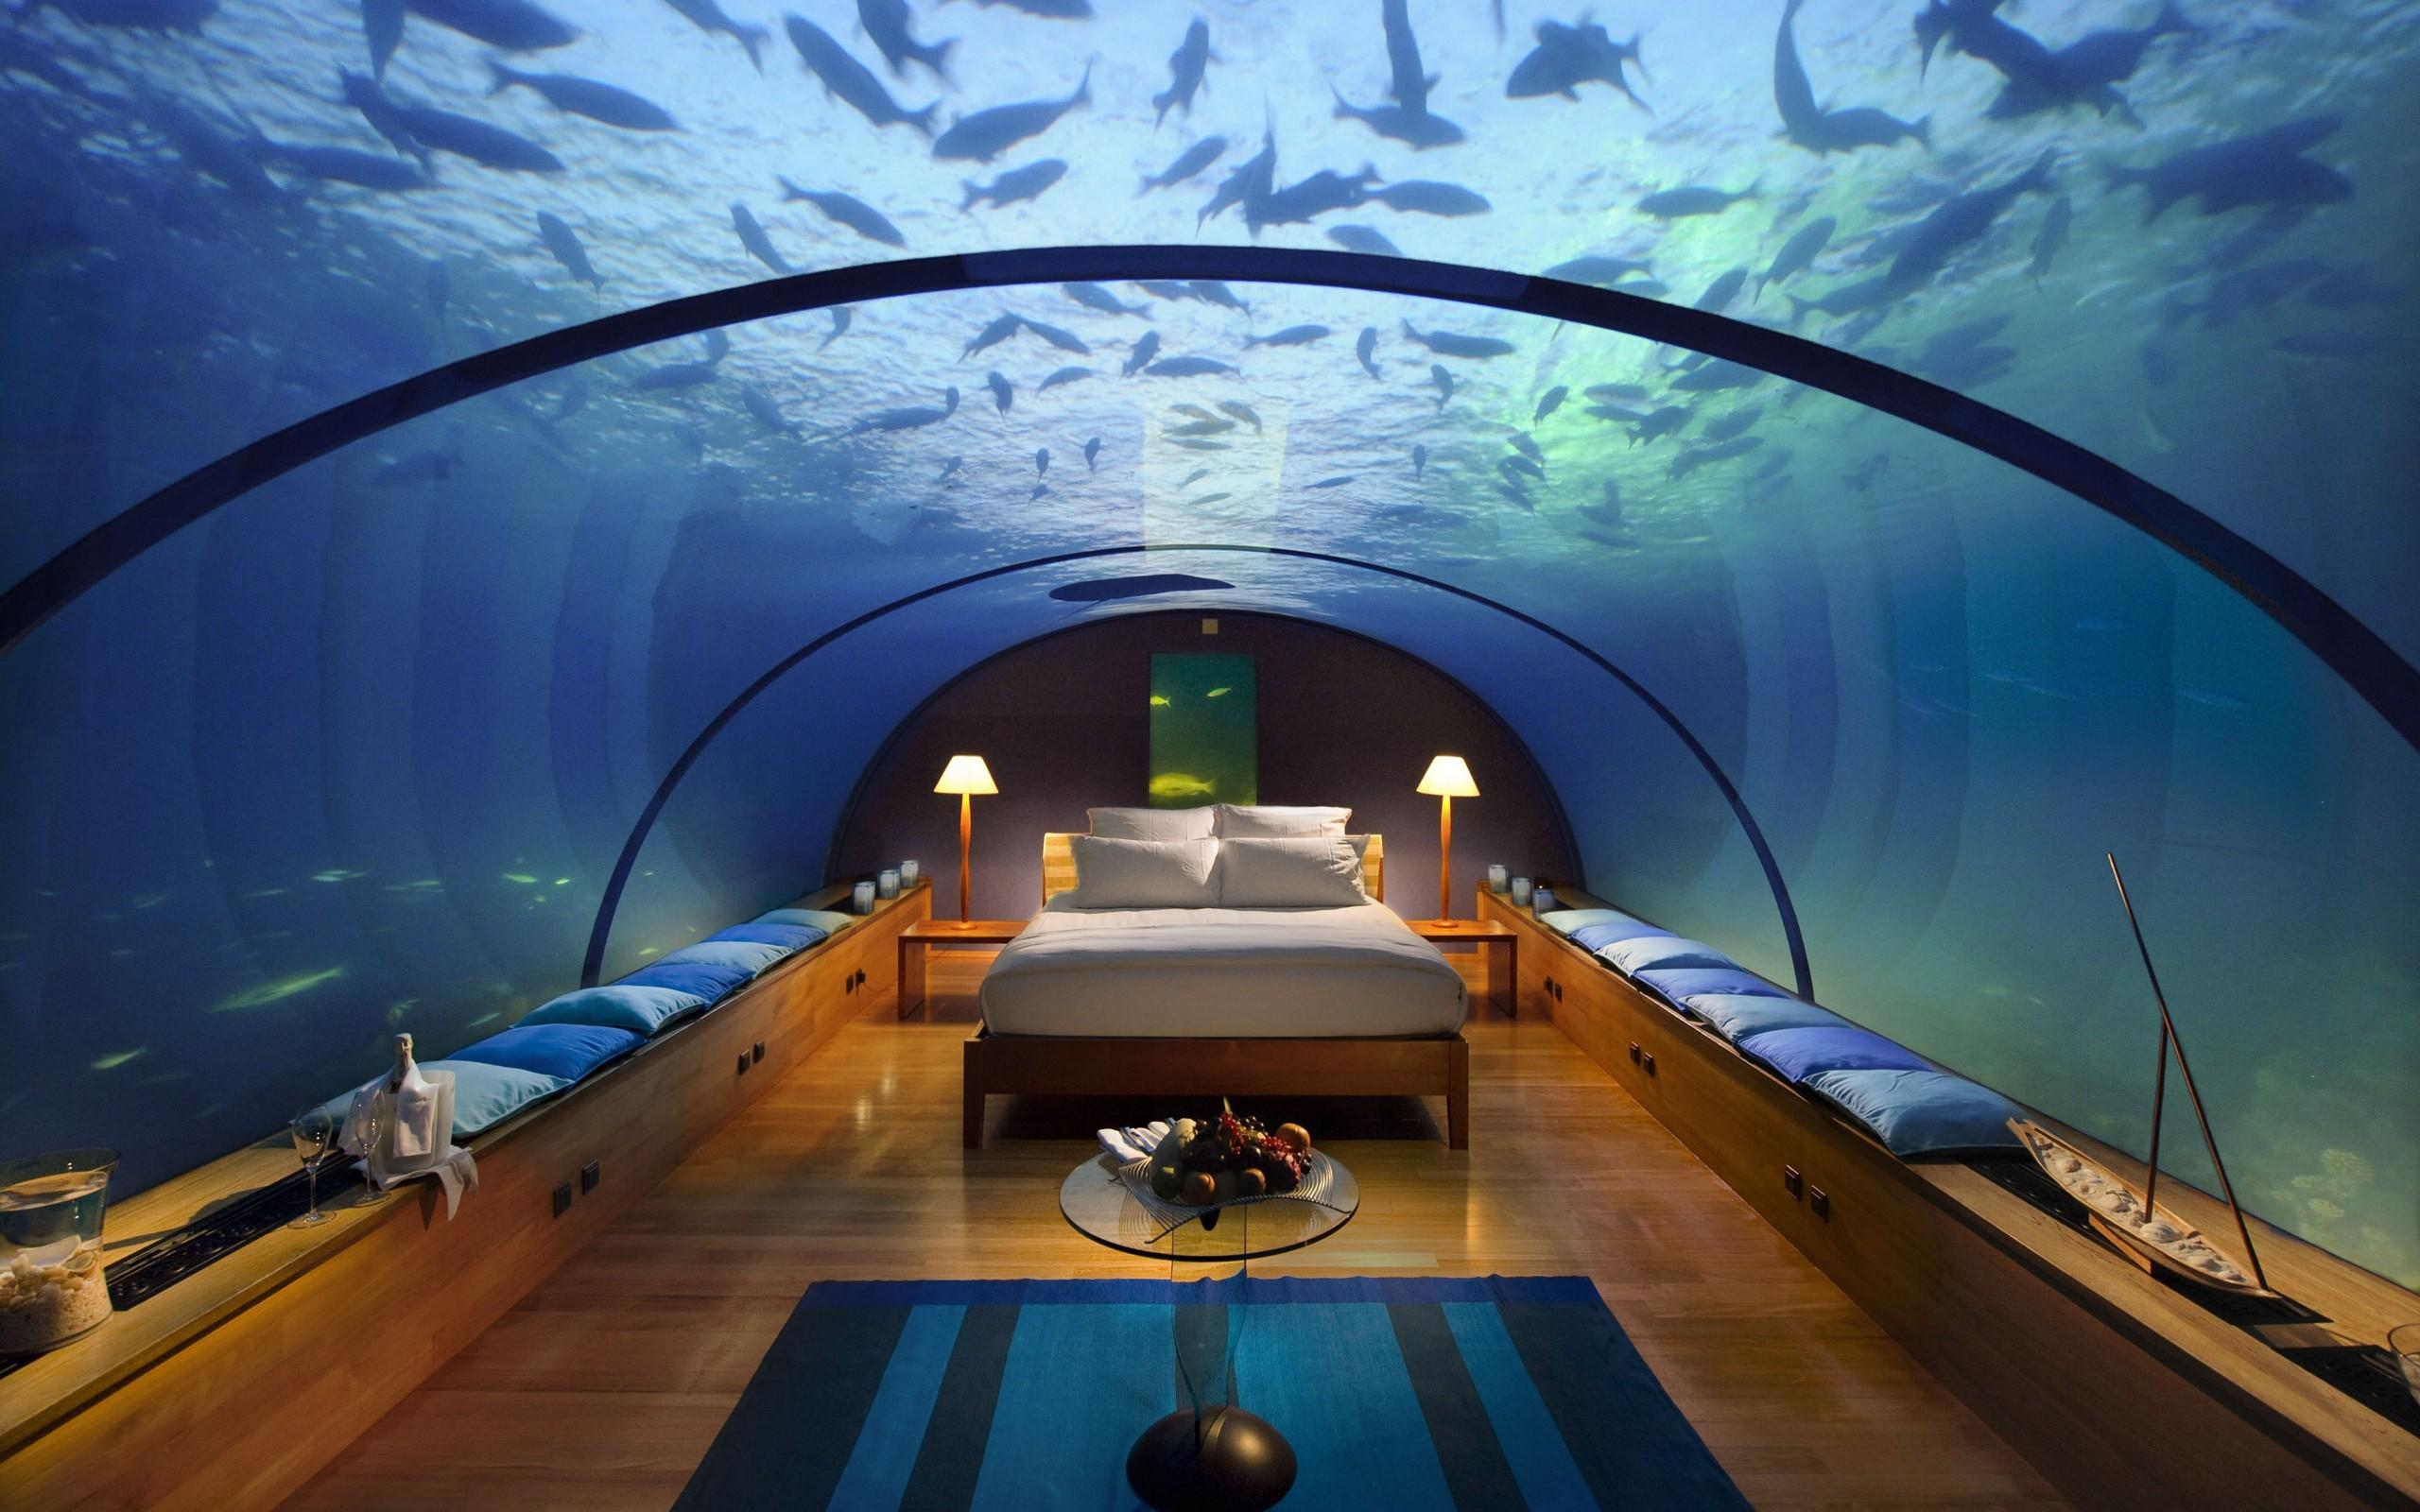 Habitacion con panorama acuatico - 2560x1600